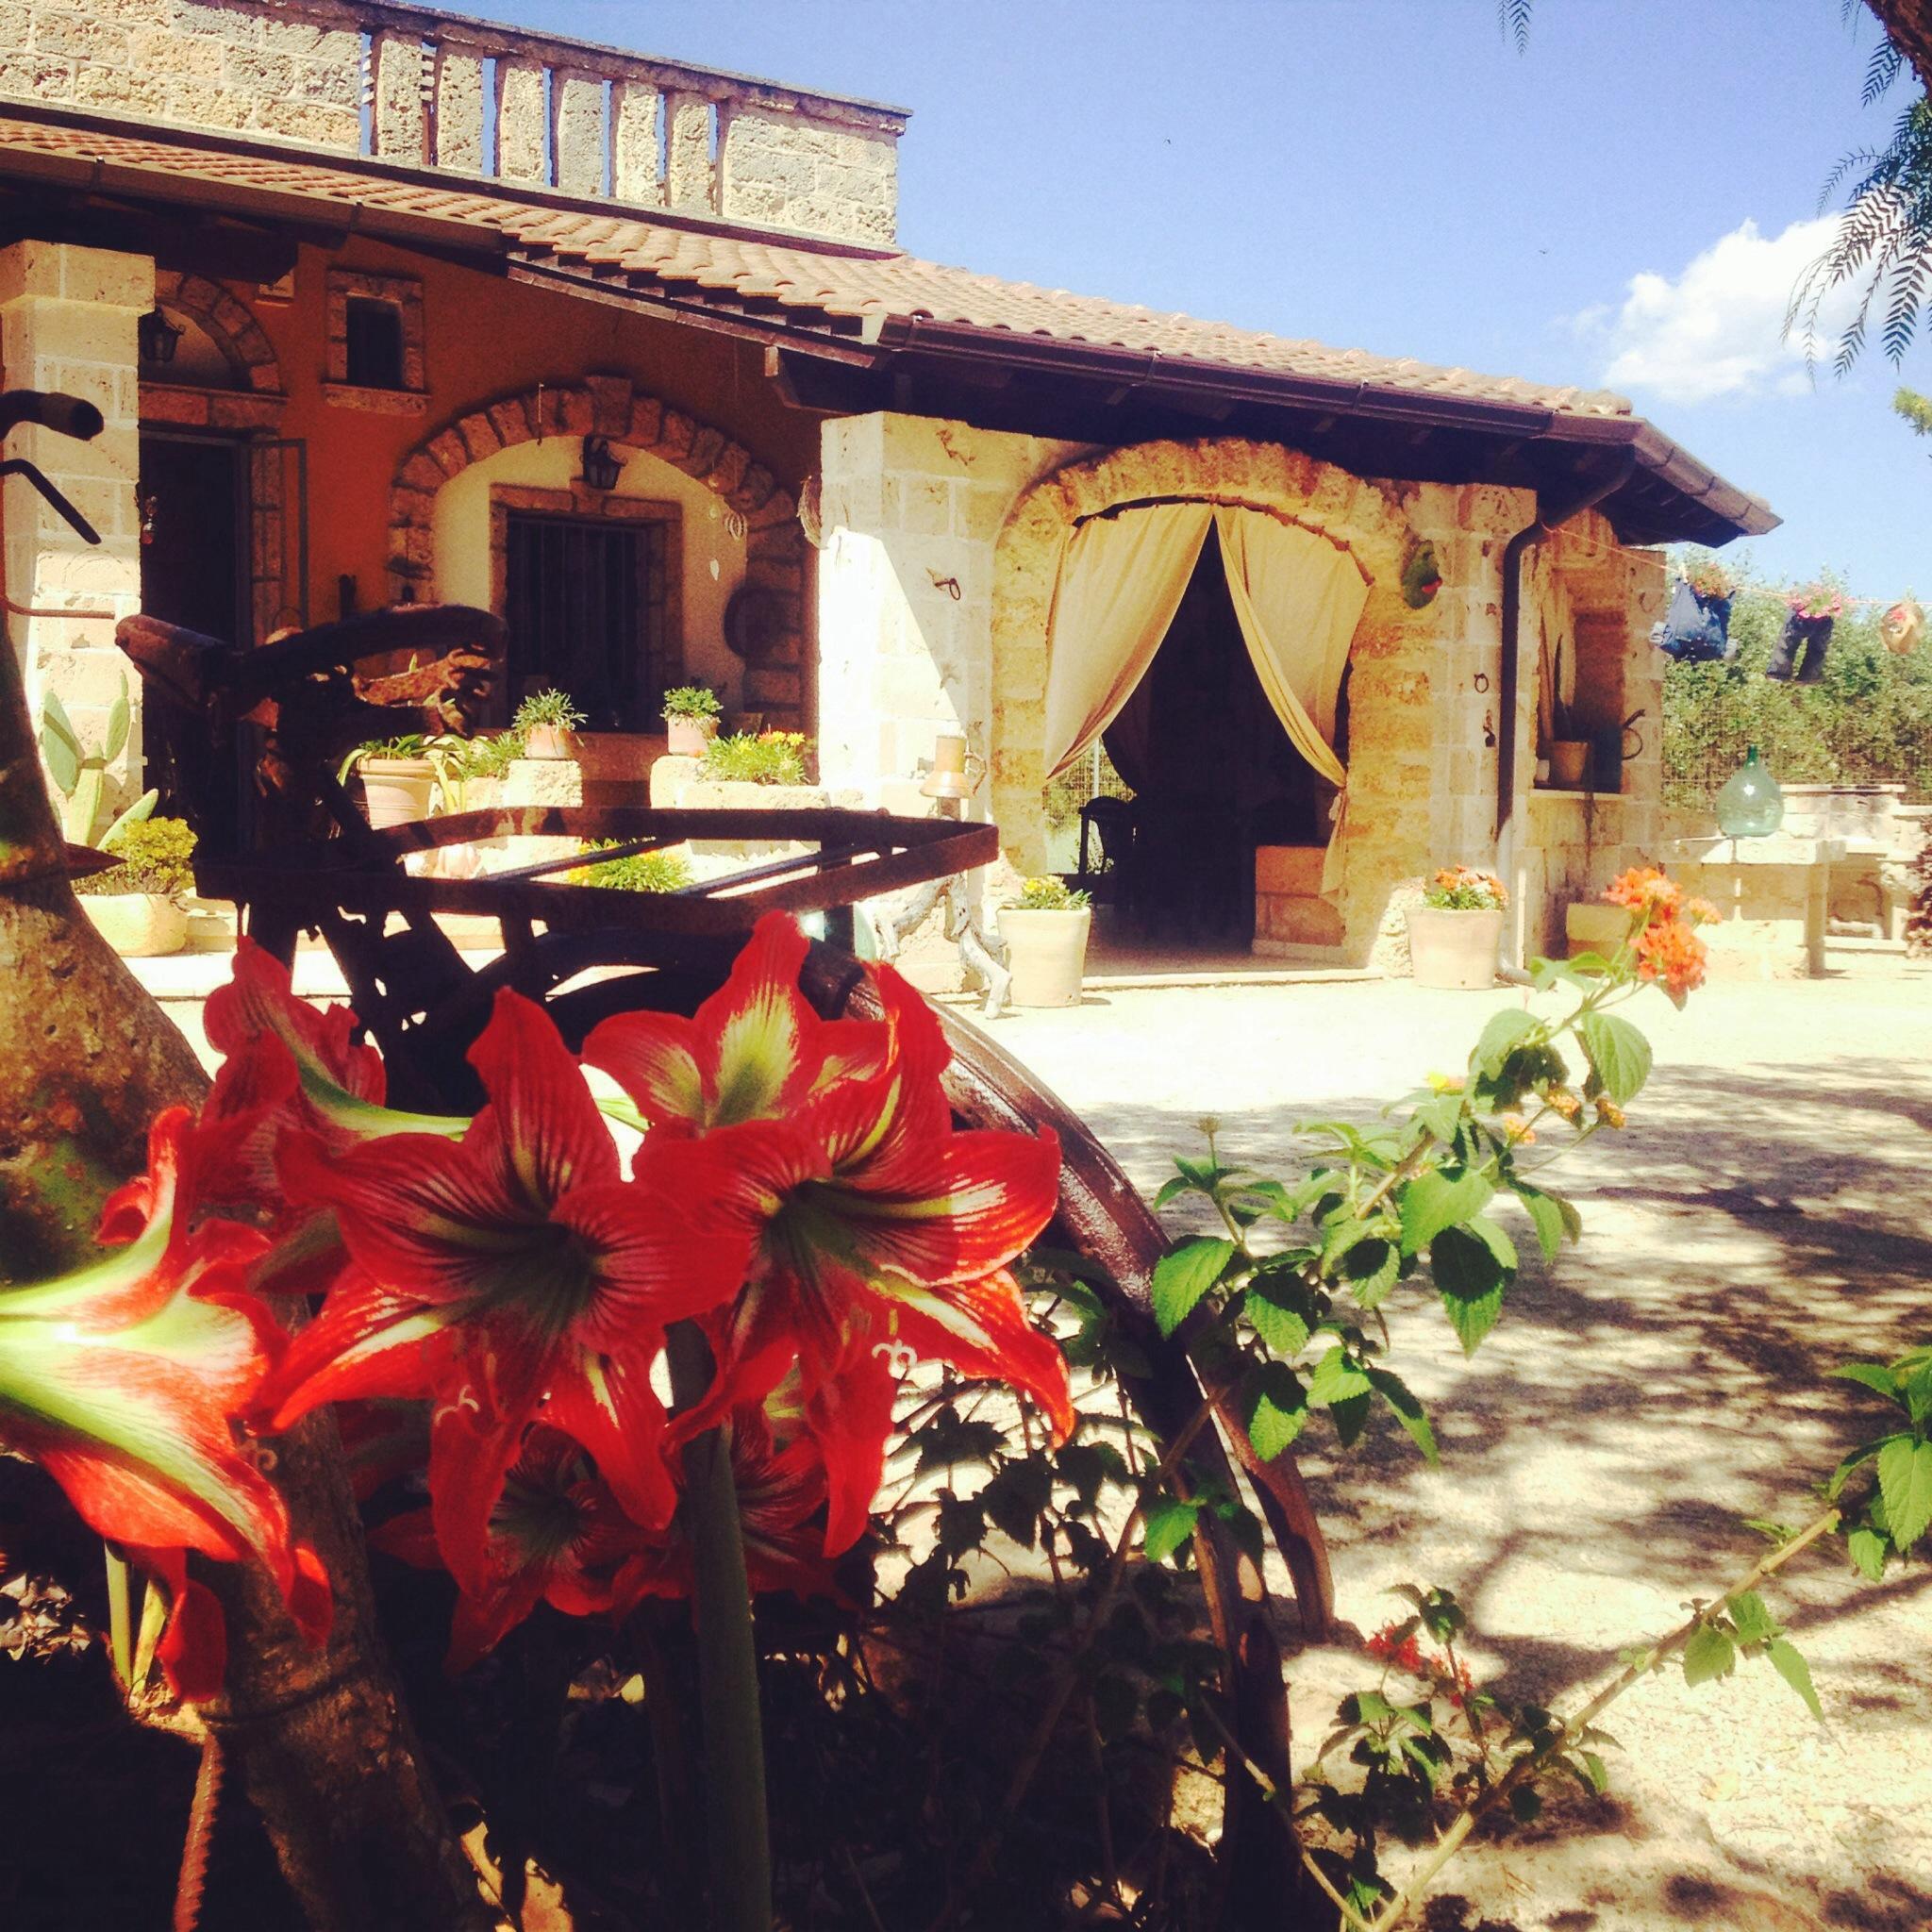 B&B Villa Silmona